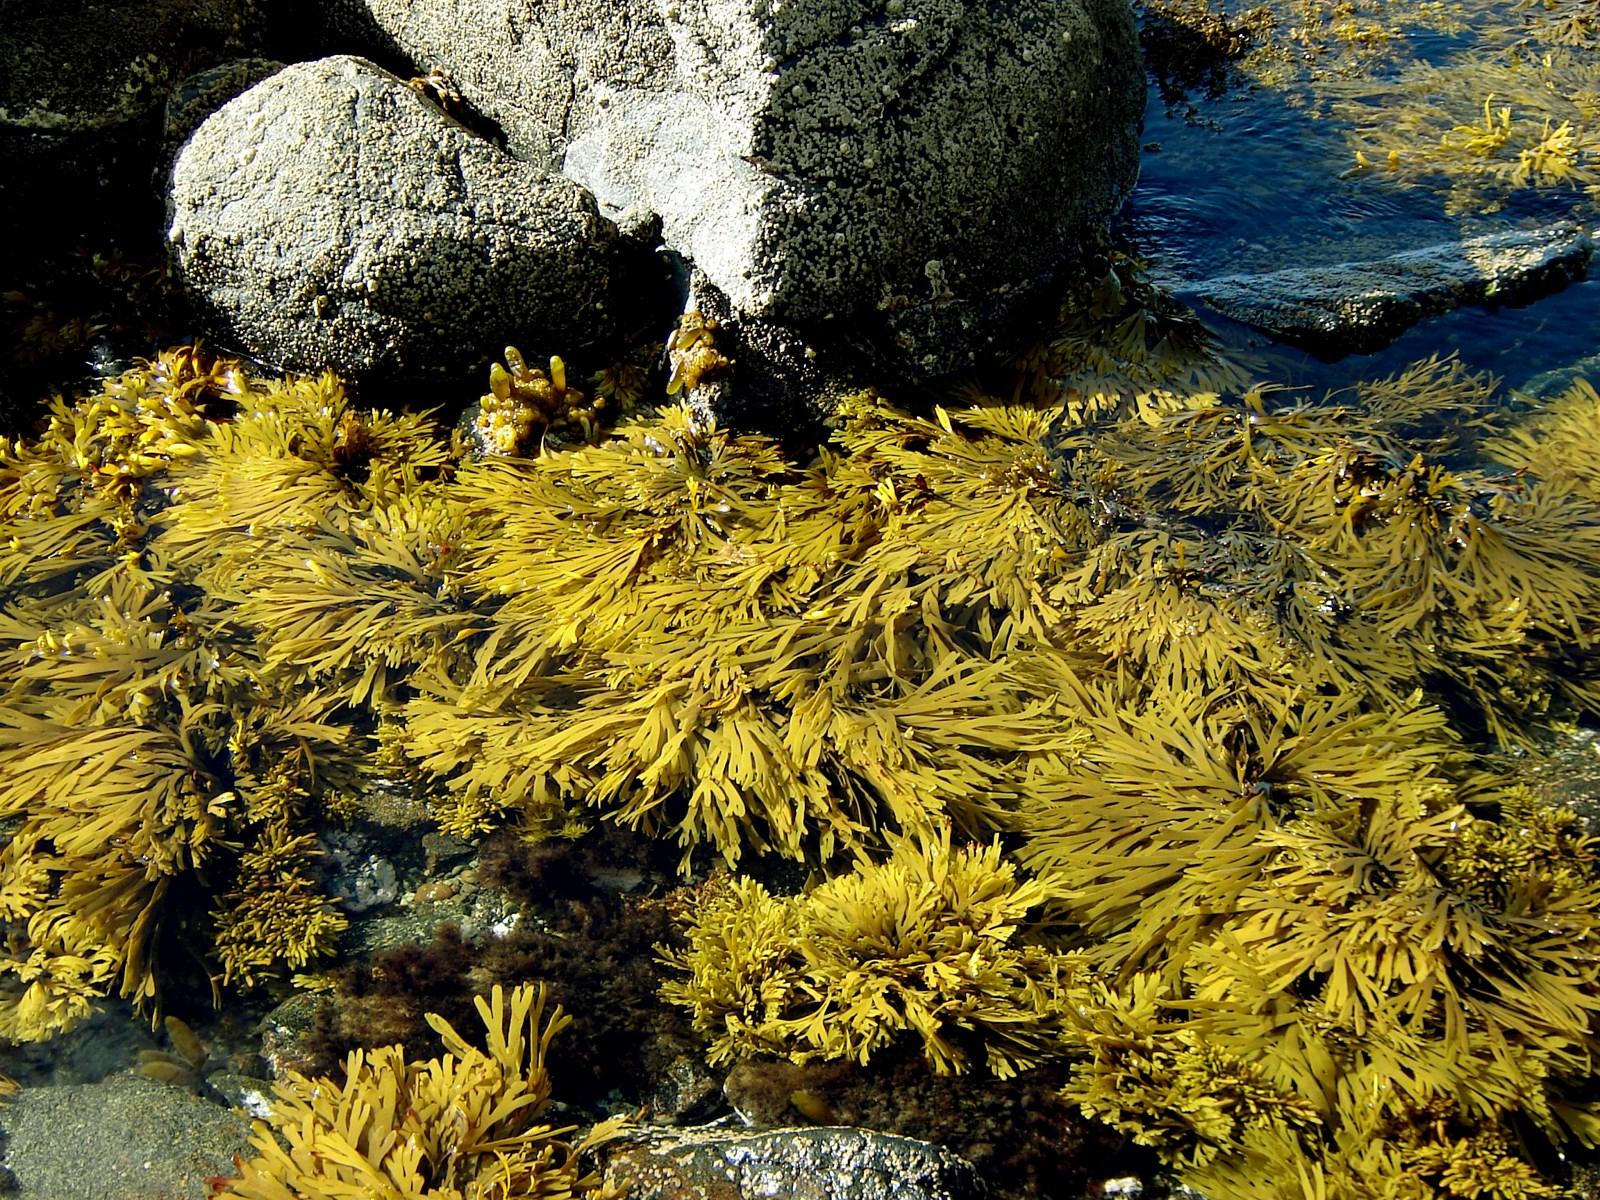 xiphophora_gladiata_subsp_novae-zelandiae_st_island (Copiar).jpg